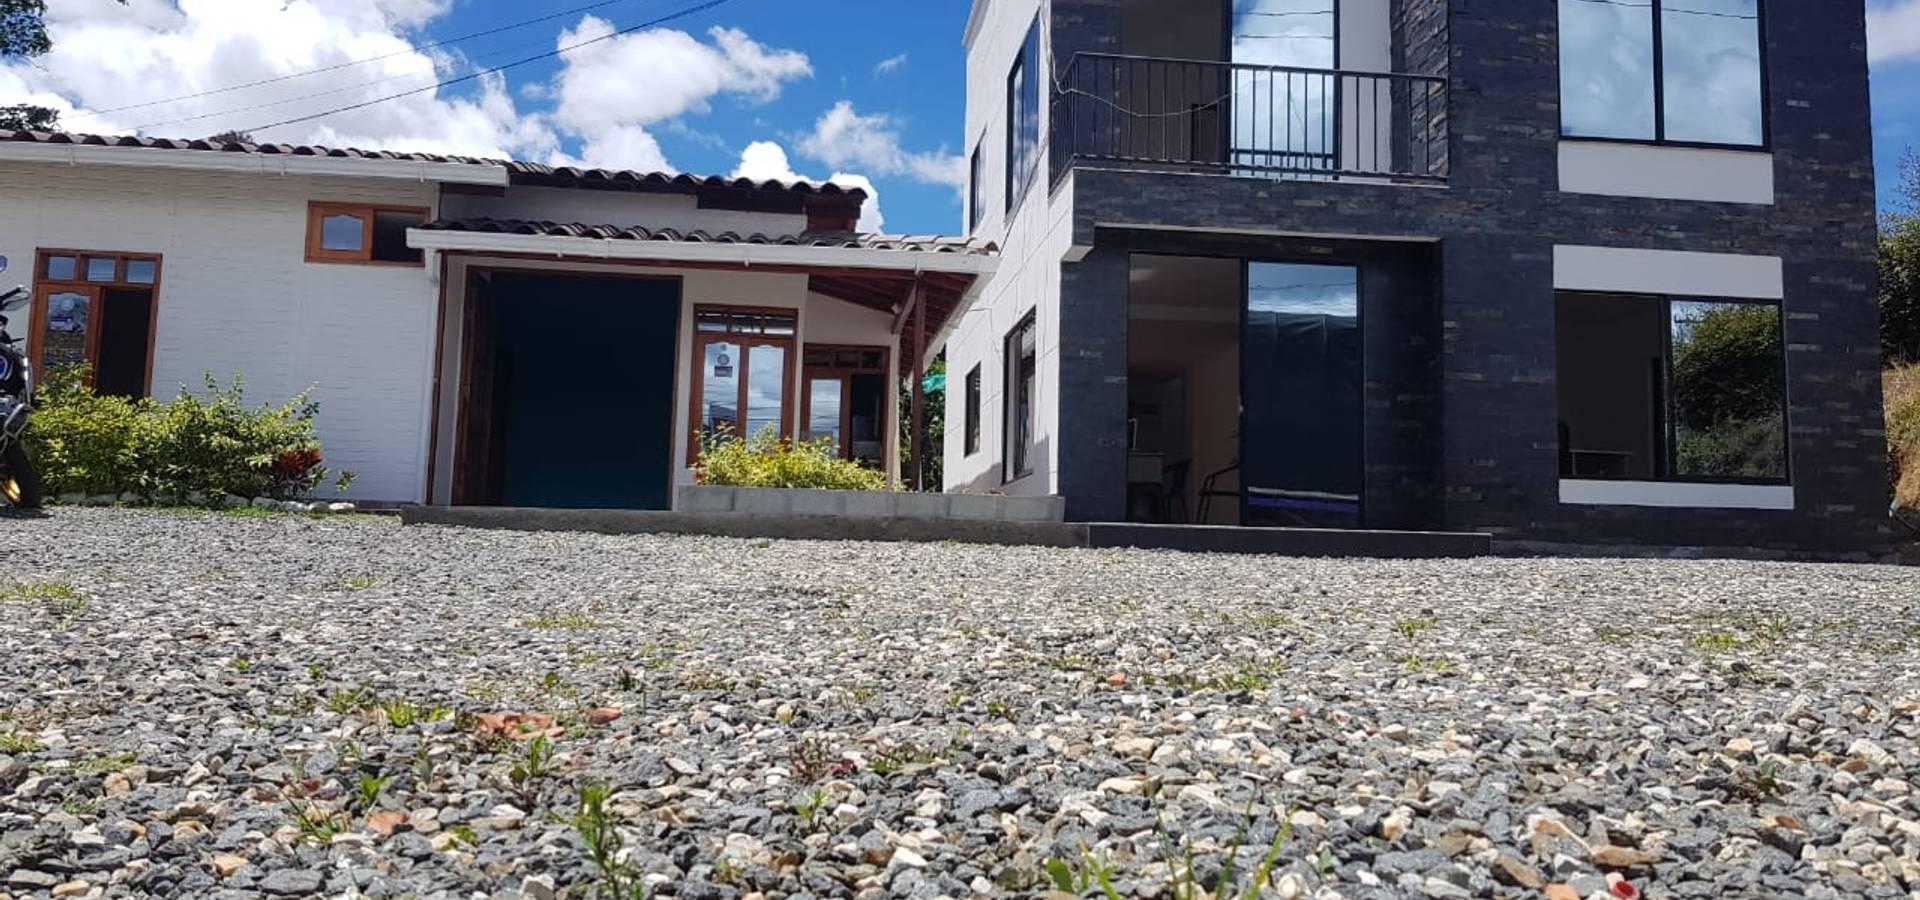 Constru Casas Prefabricados SAS